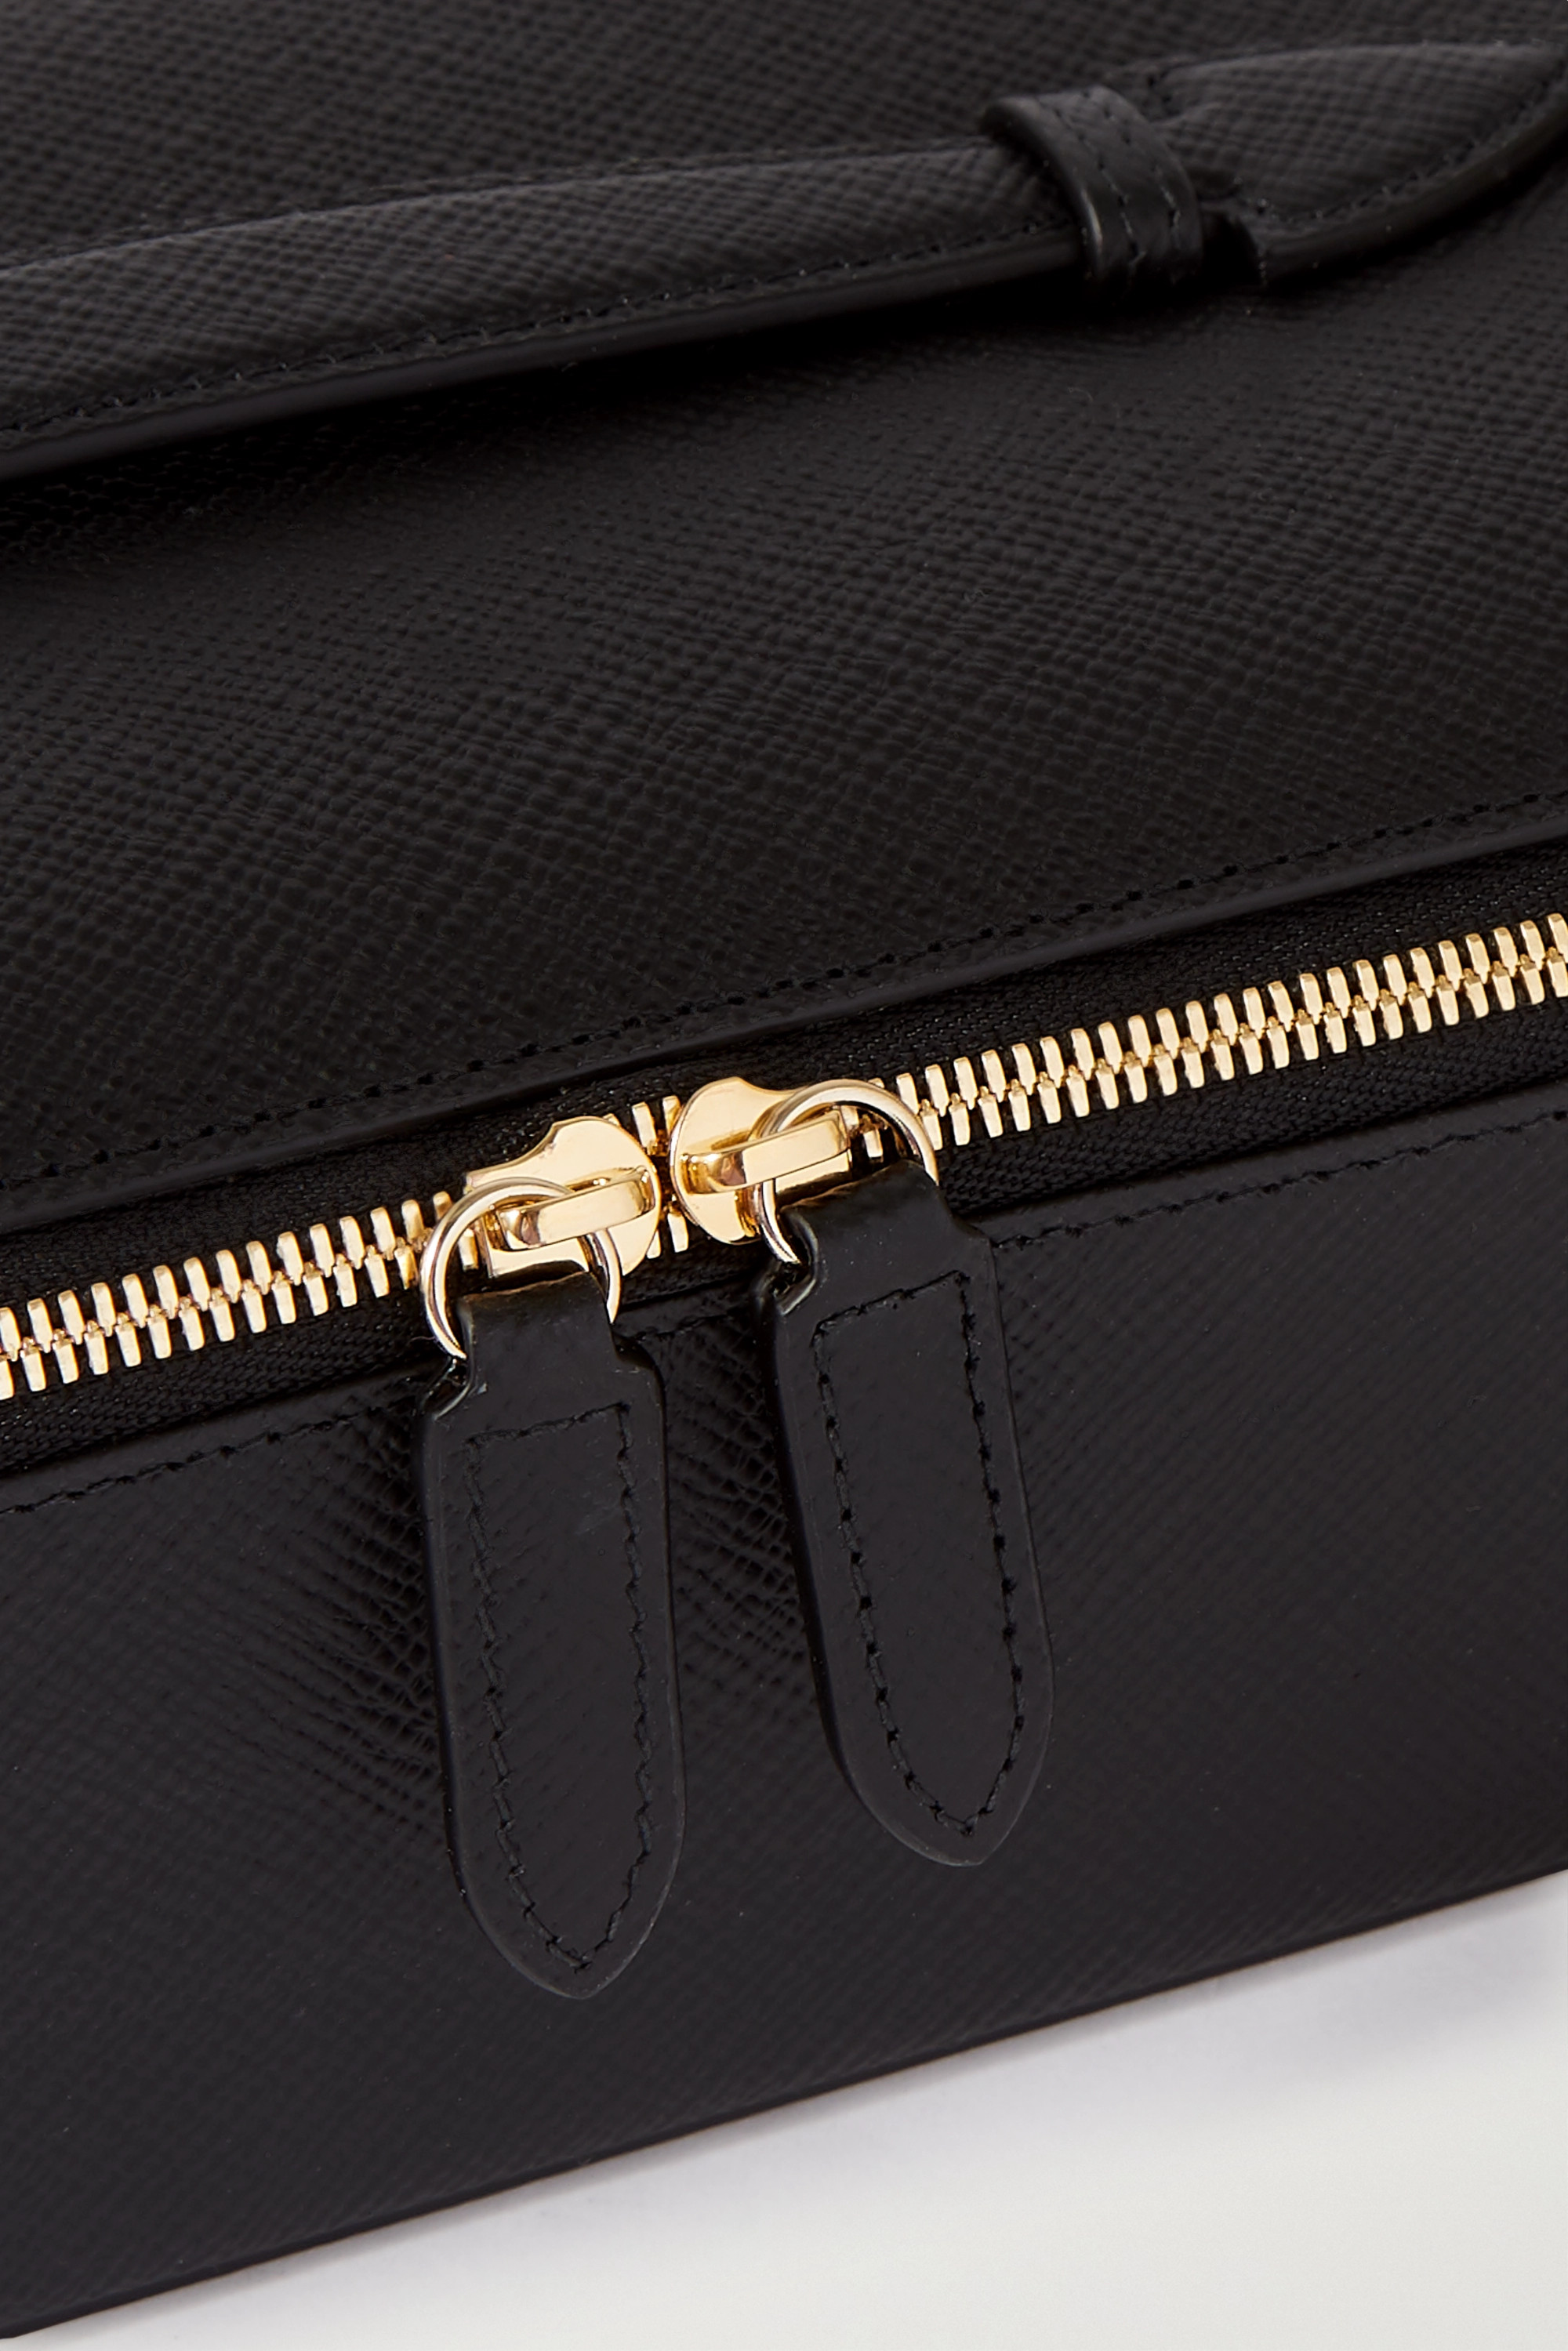 Smythson Panama Schmuckkasten aus strukturiertem Leder